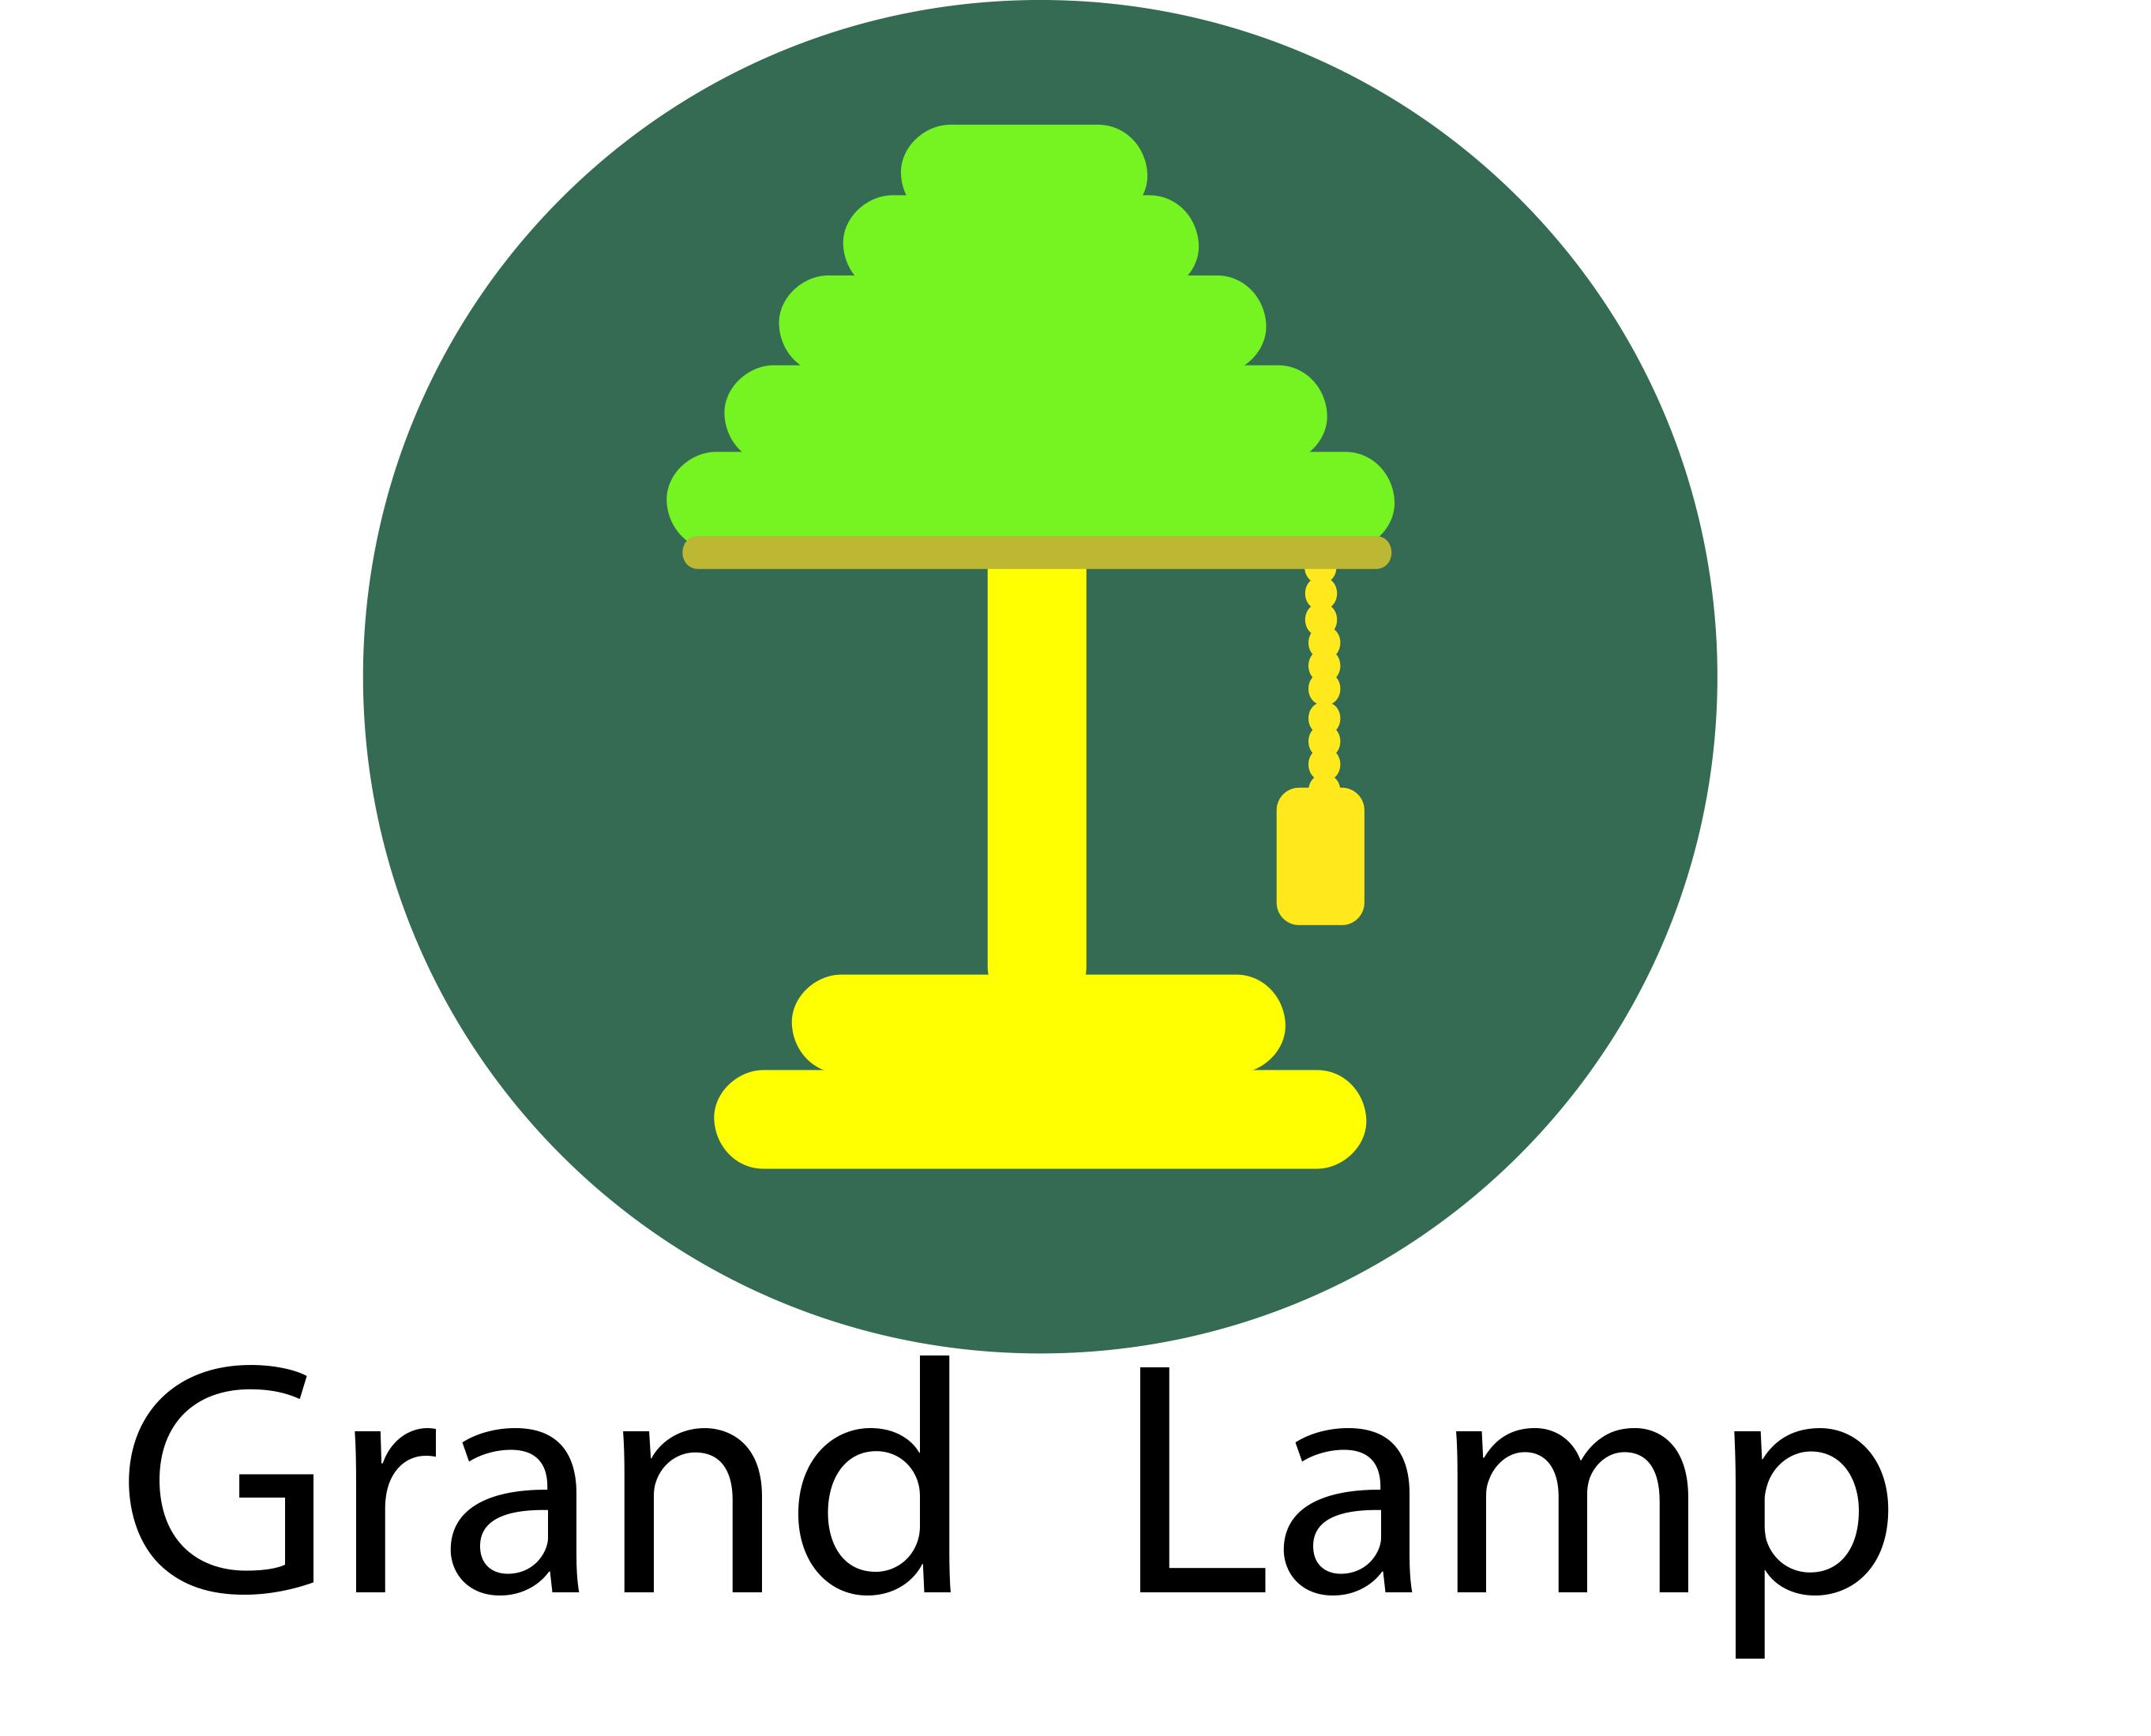 Разработка логотипа и элементов фирменного стиля фото f_93057f0158389543.jpg